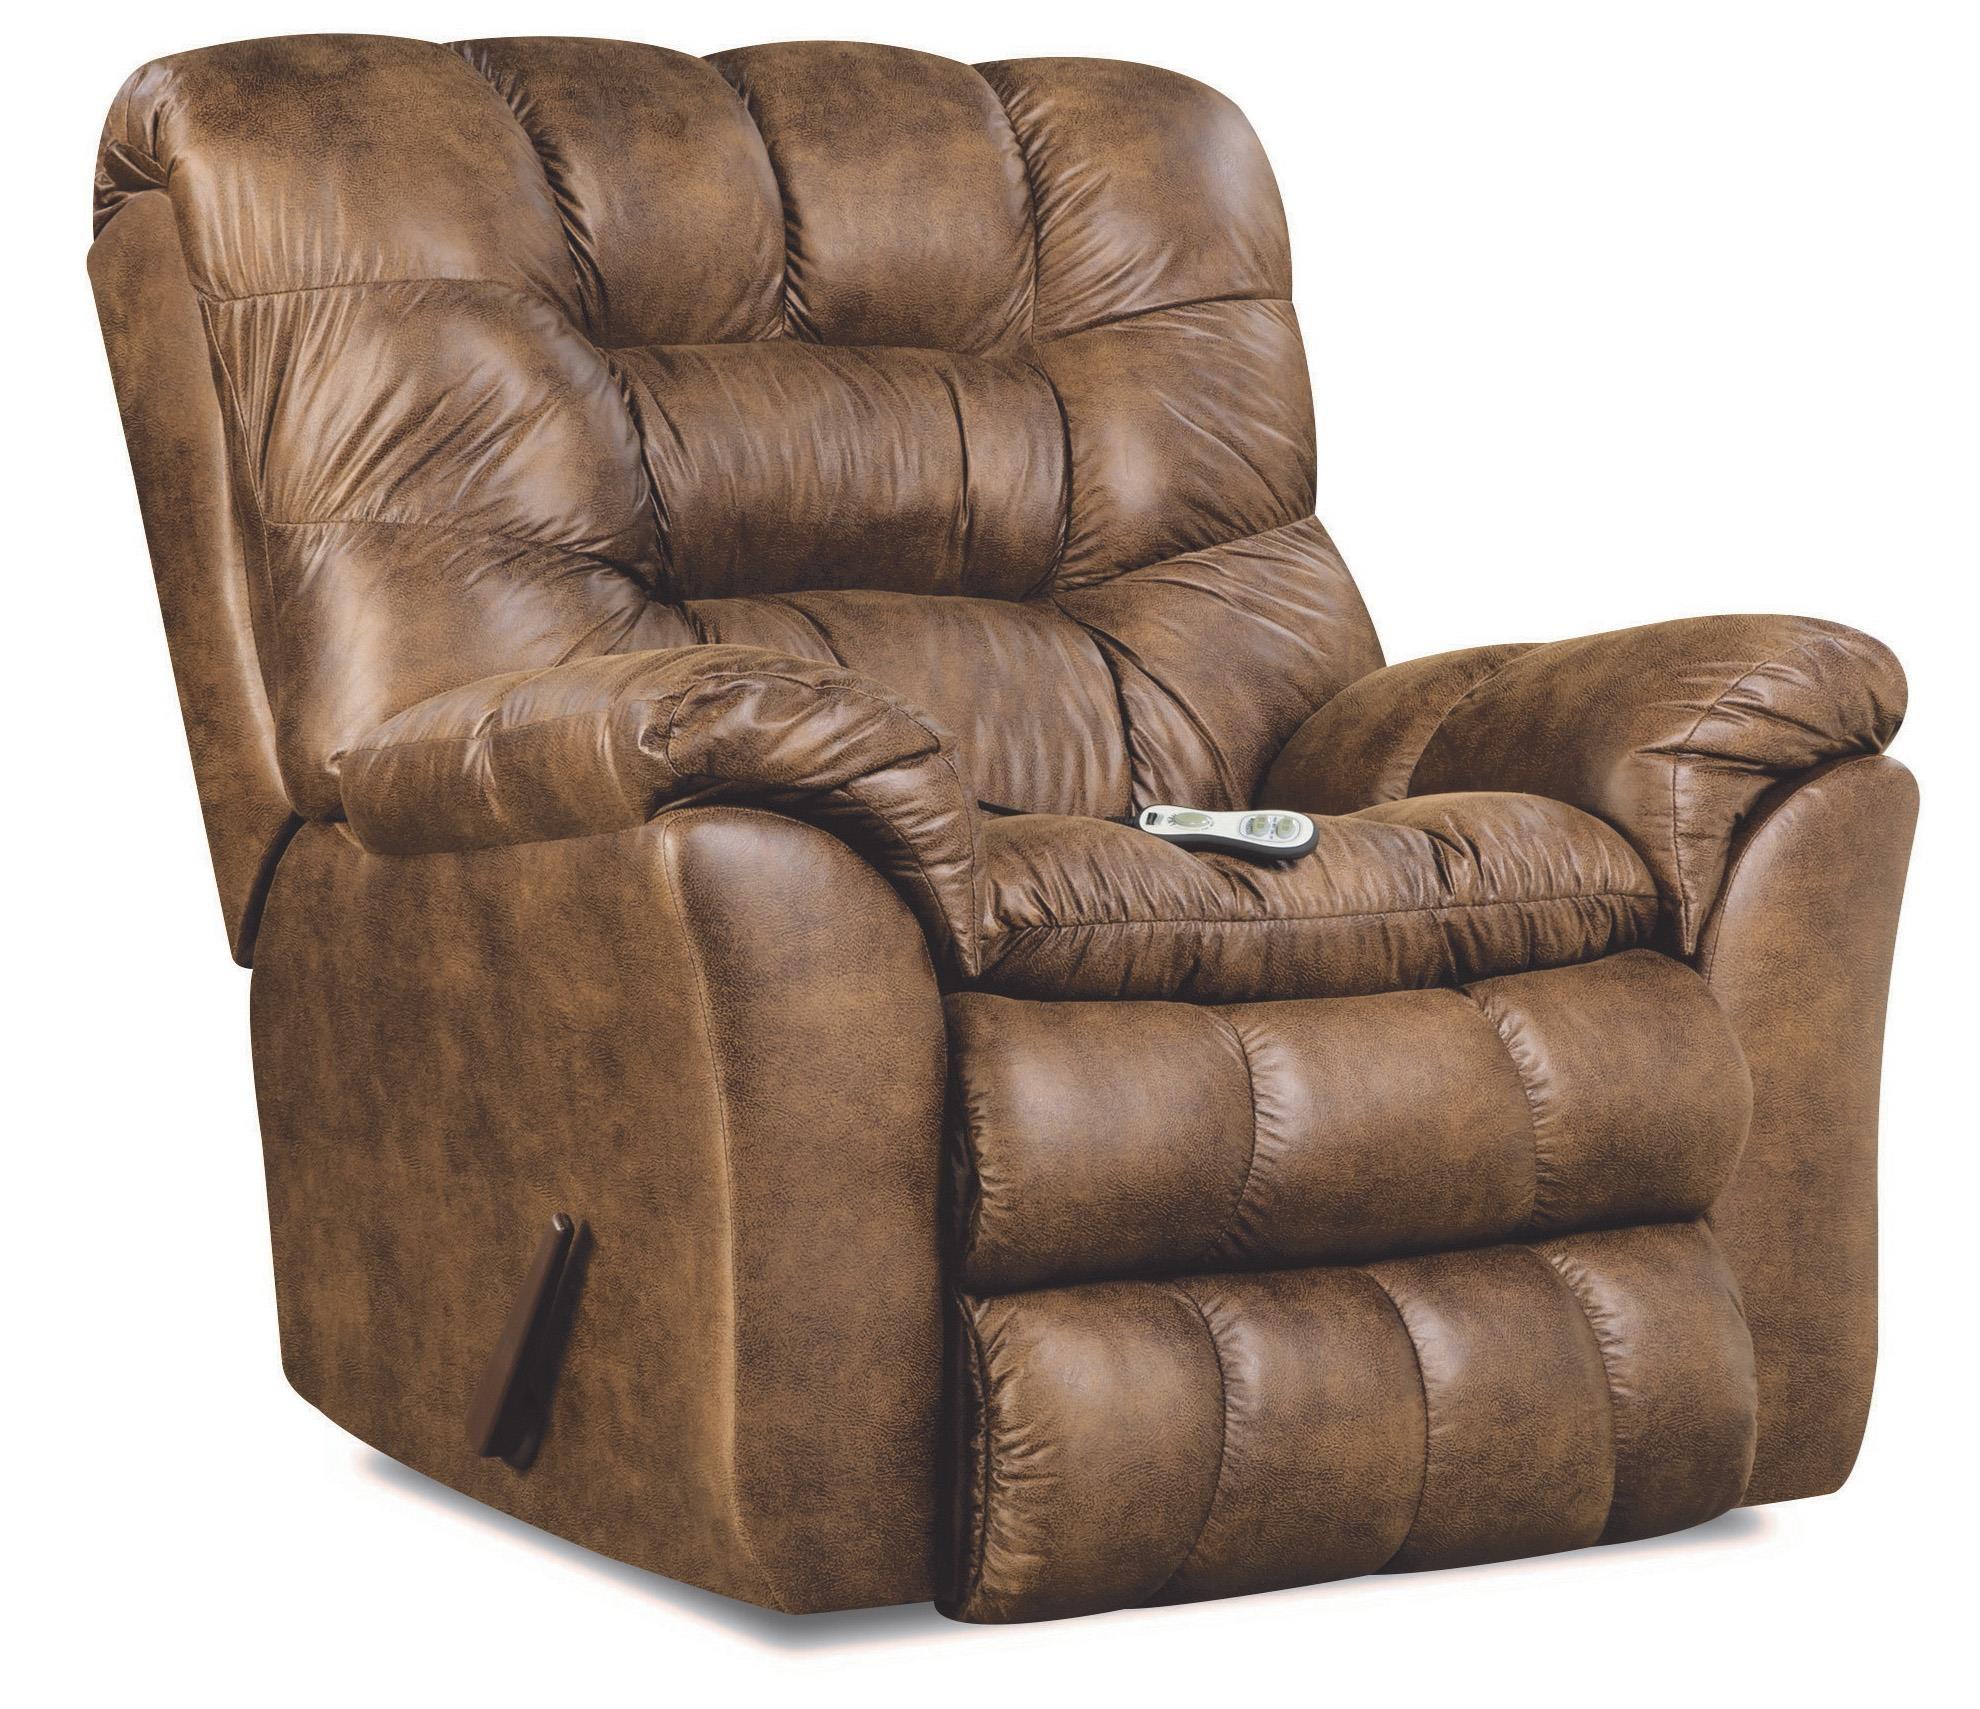 Royal Furniture Southaven Ms Lifestyle C5934 King Bedroom Royal Furniture Fairmont Designs